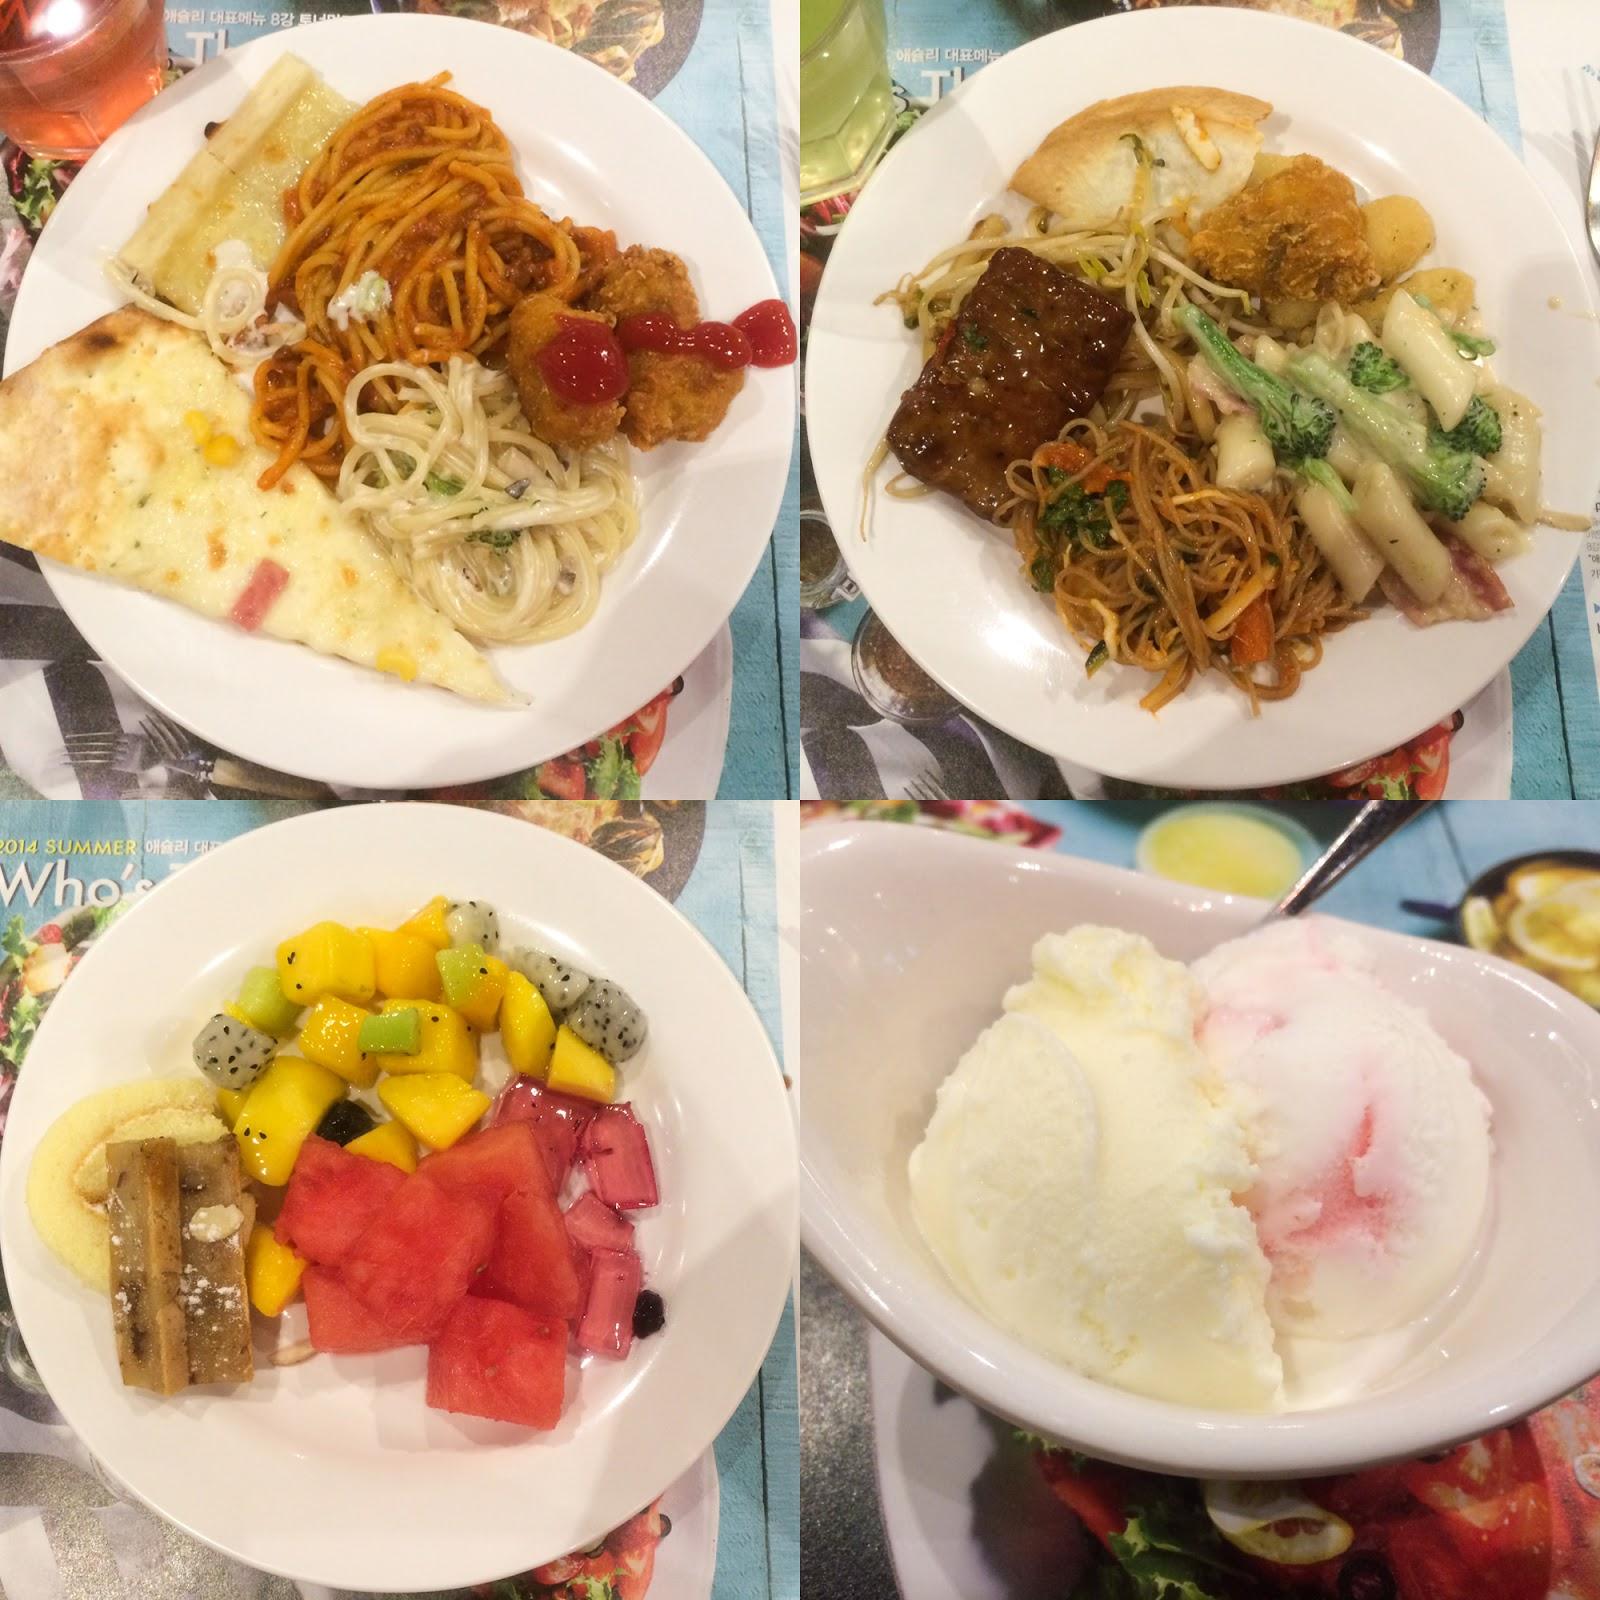 Seoul, Korea - Summer Study Abroad 2014 - Seoul City Touring - Ashley Korean buffet lunch